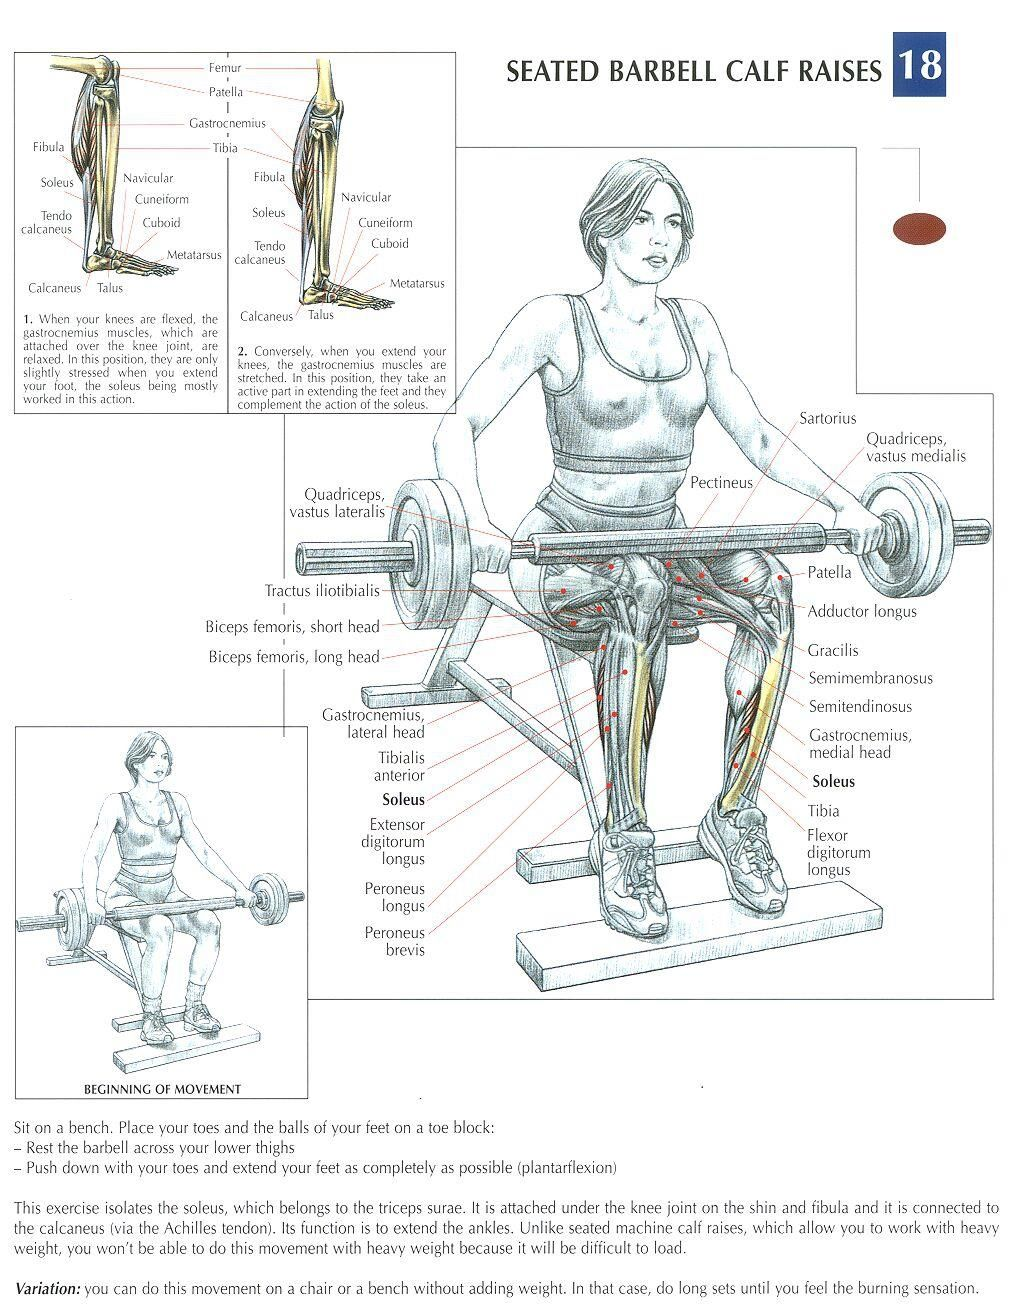 Seated barbell calf raises | Desenhos de anatomia | Pinterest ...